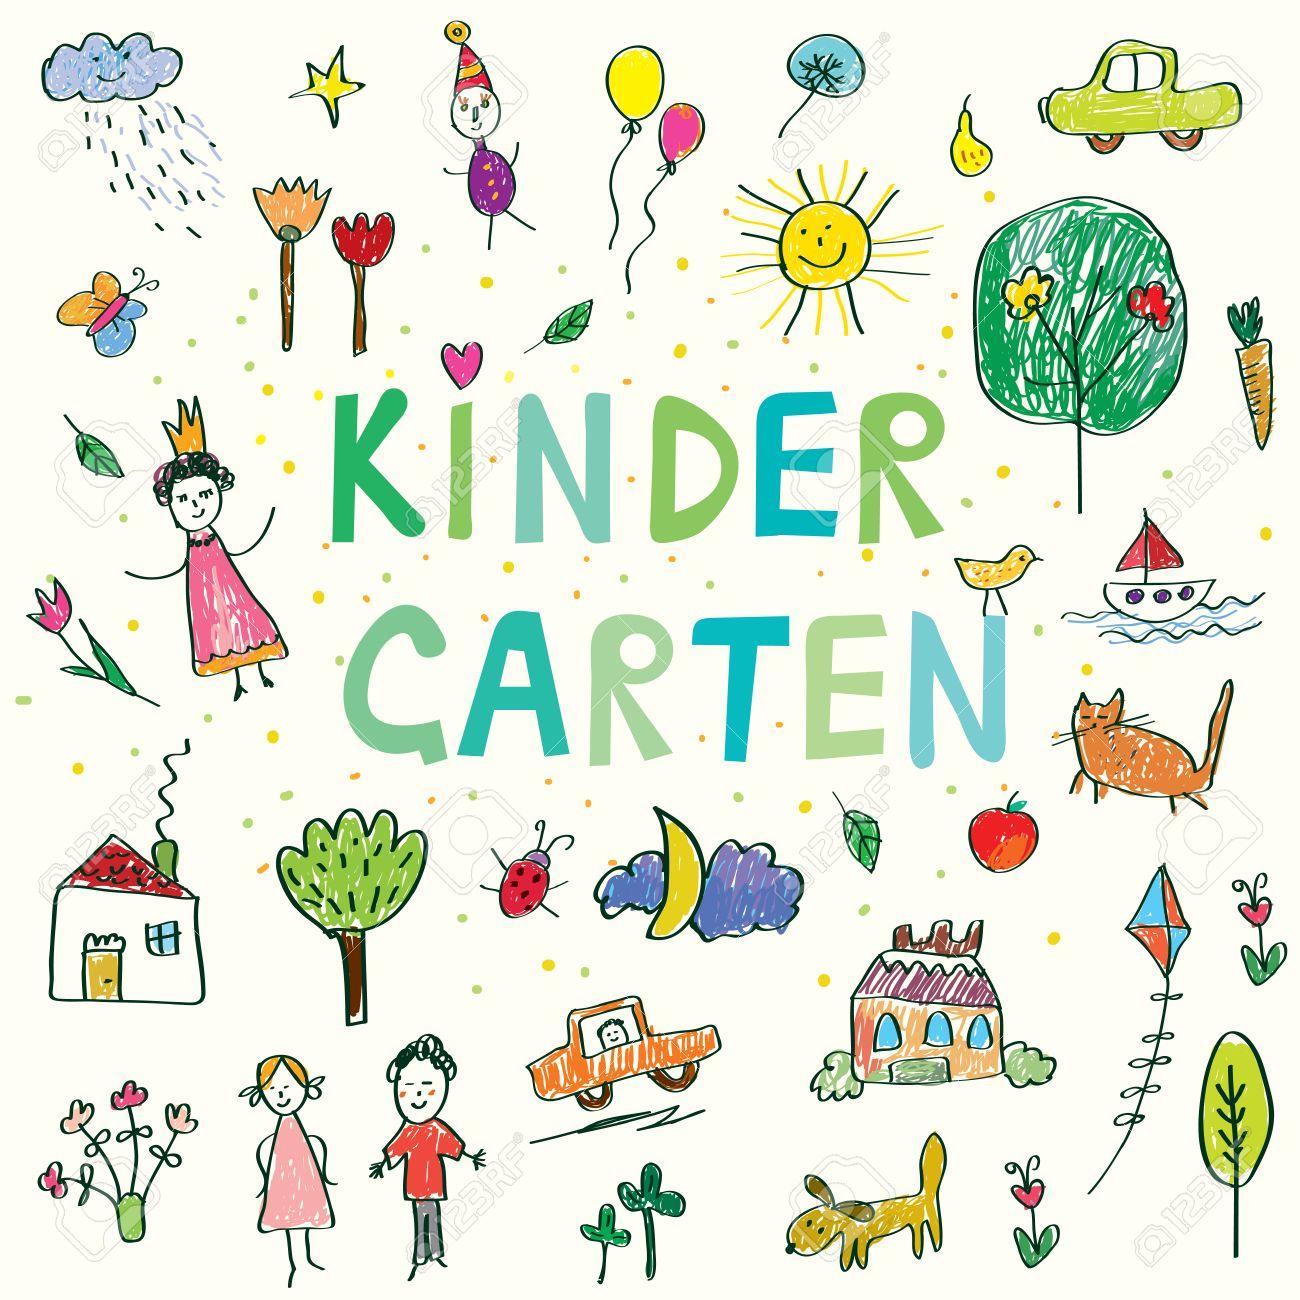 53893414-kindergarten-banner-with-funny-kids-drawing-vector-design-Stock-Photo.jpg